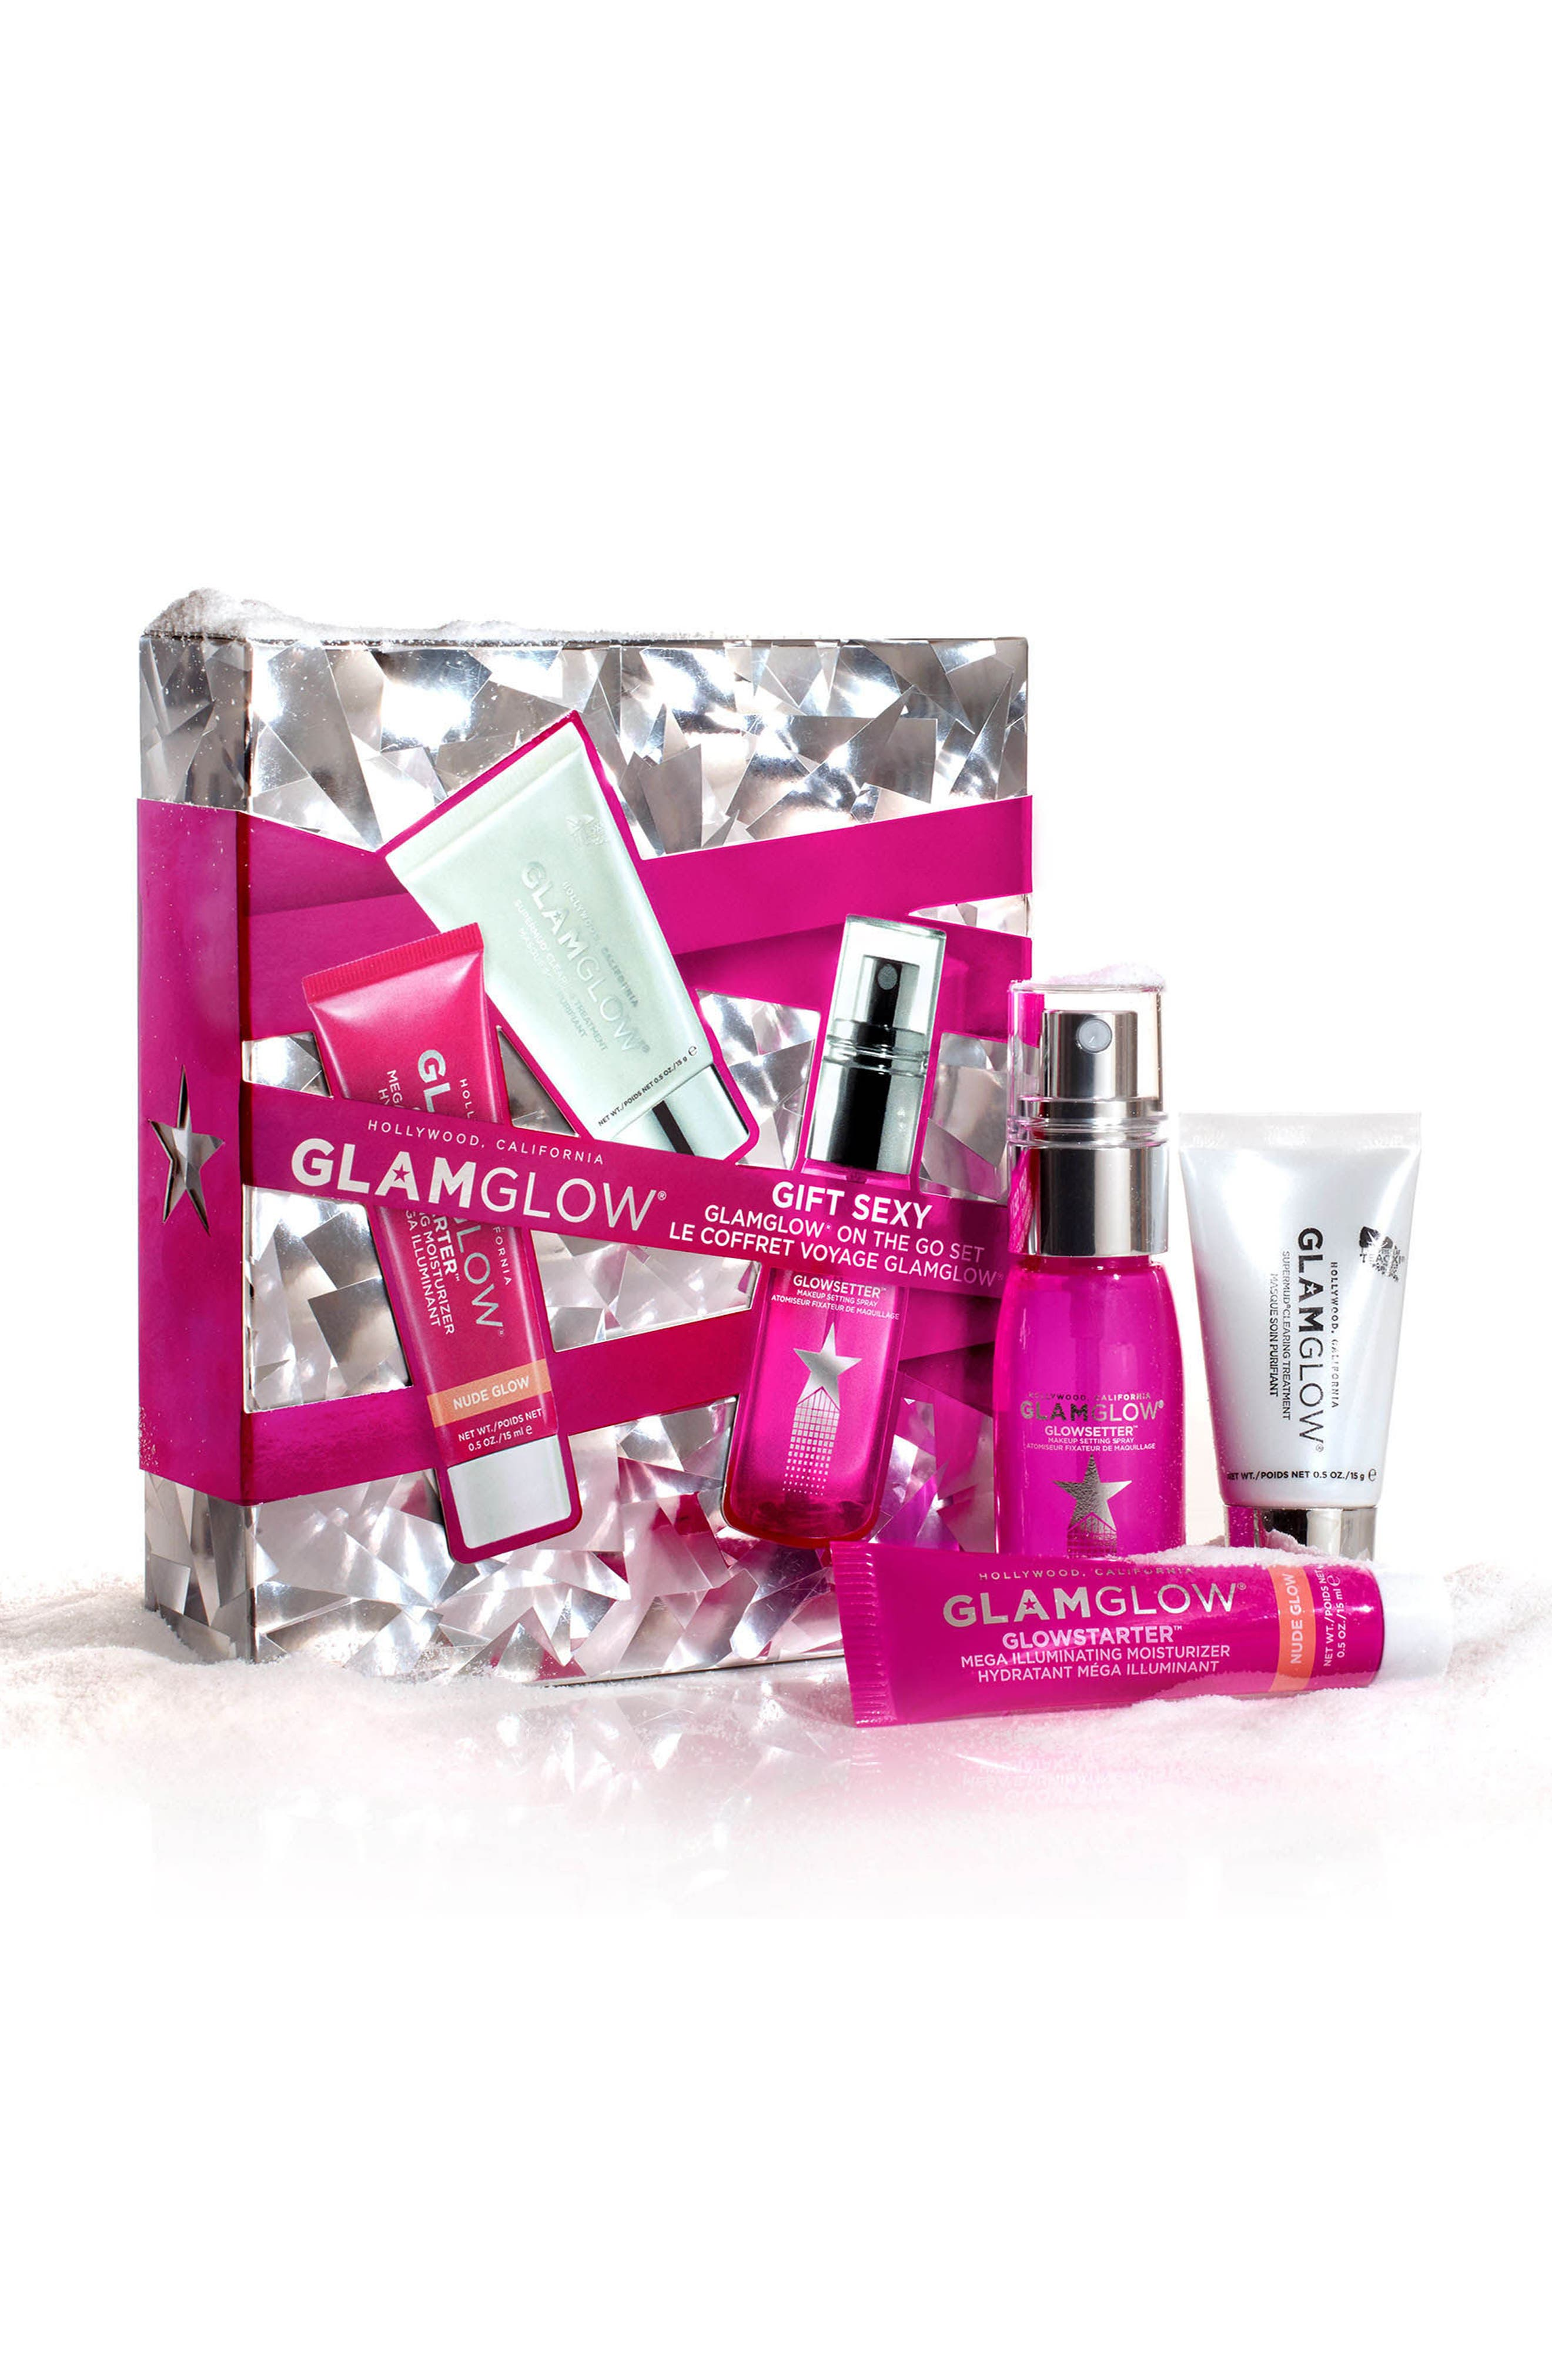 GLAMGLOW Let it Glow! Travel Set ($51 Value)